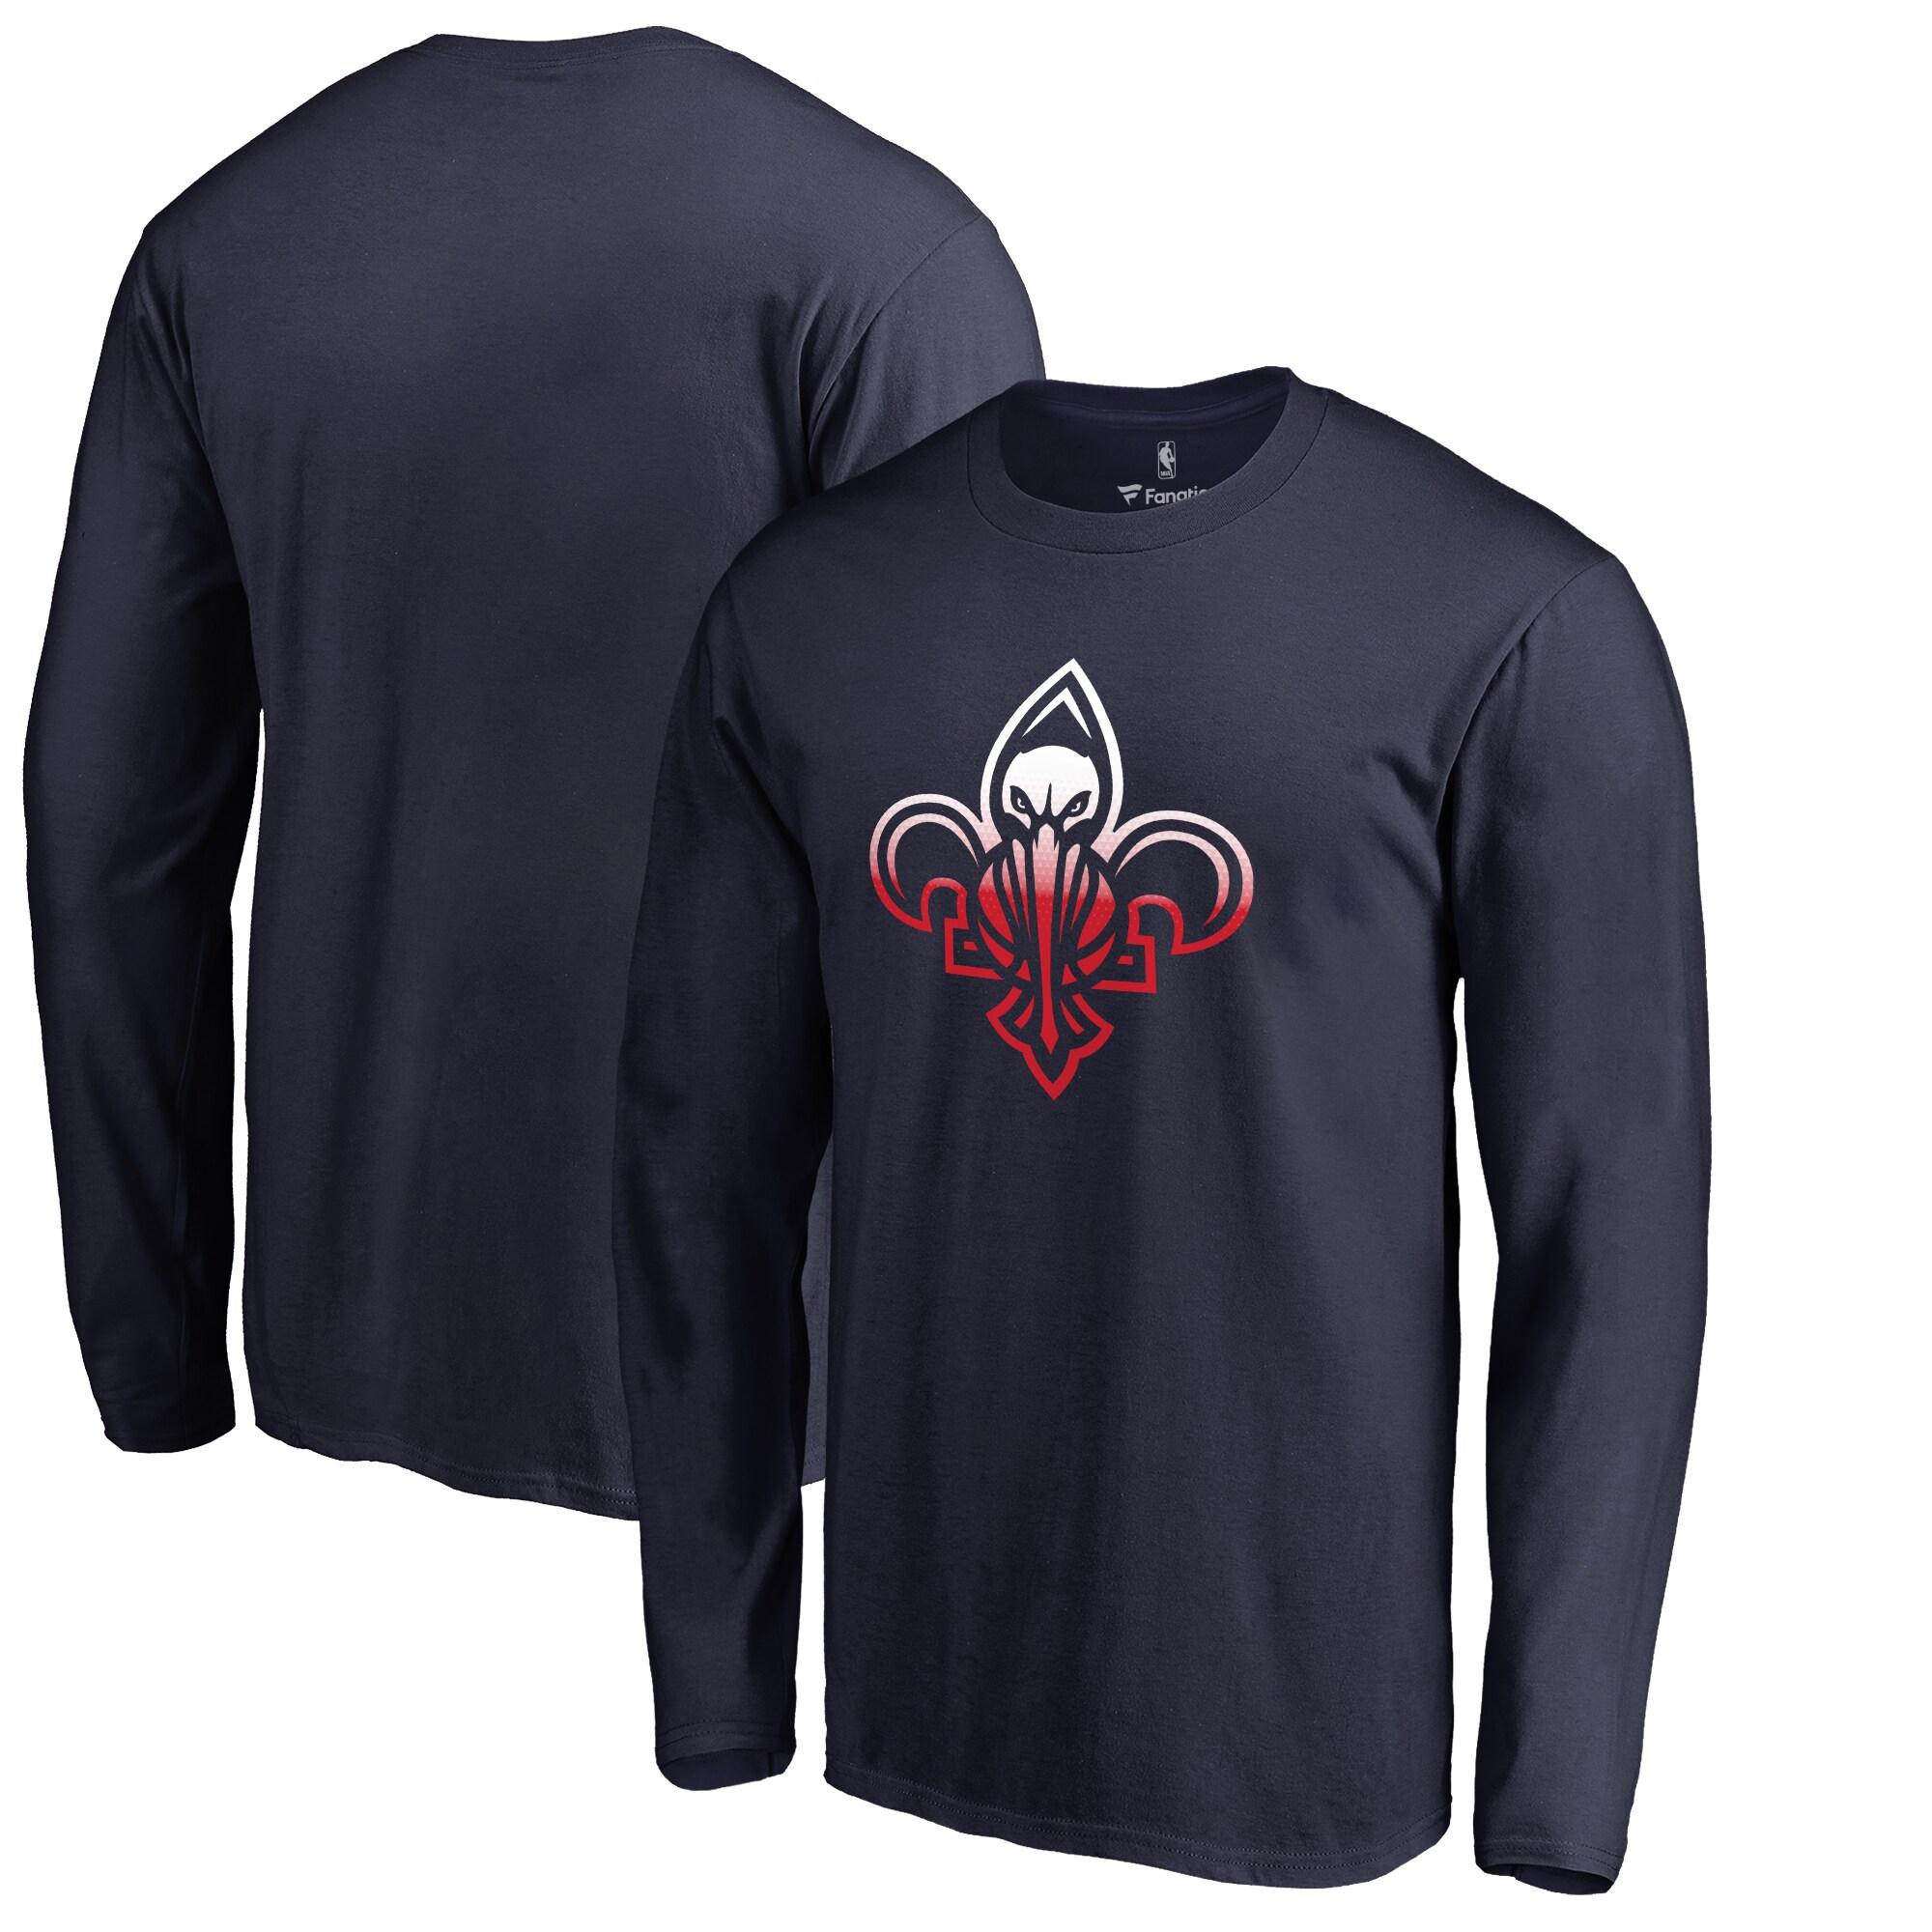 New Orleans Pelicans Fanatics Branded Big & Tall Gradient Logo Long Sleeve T-Shirt - Navy